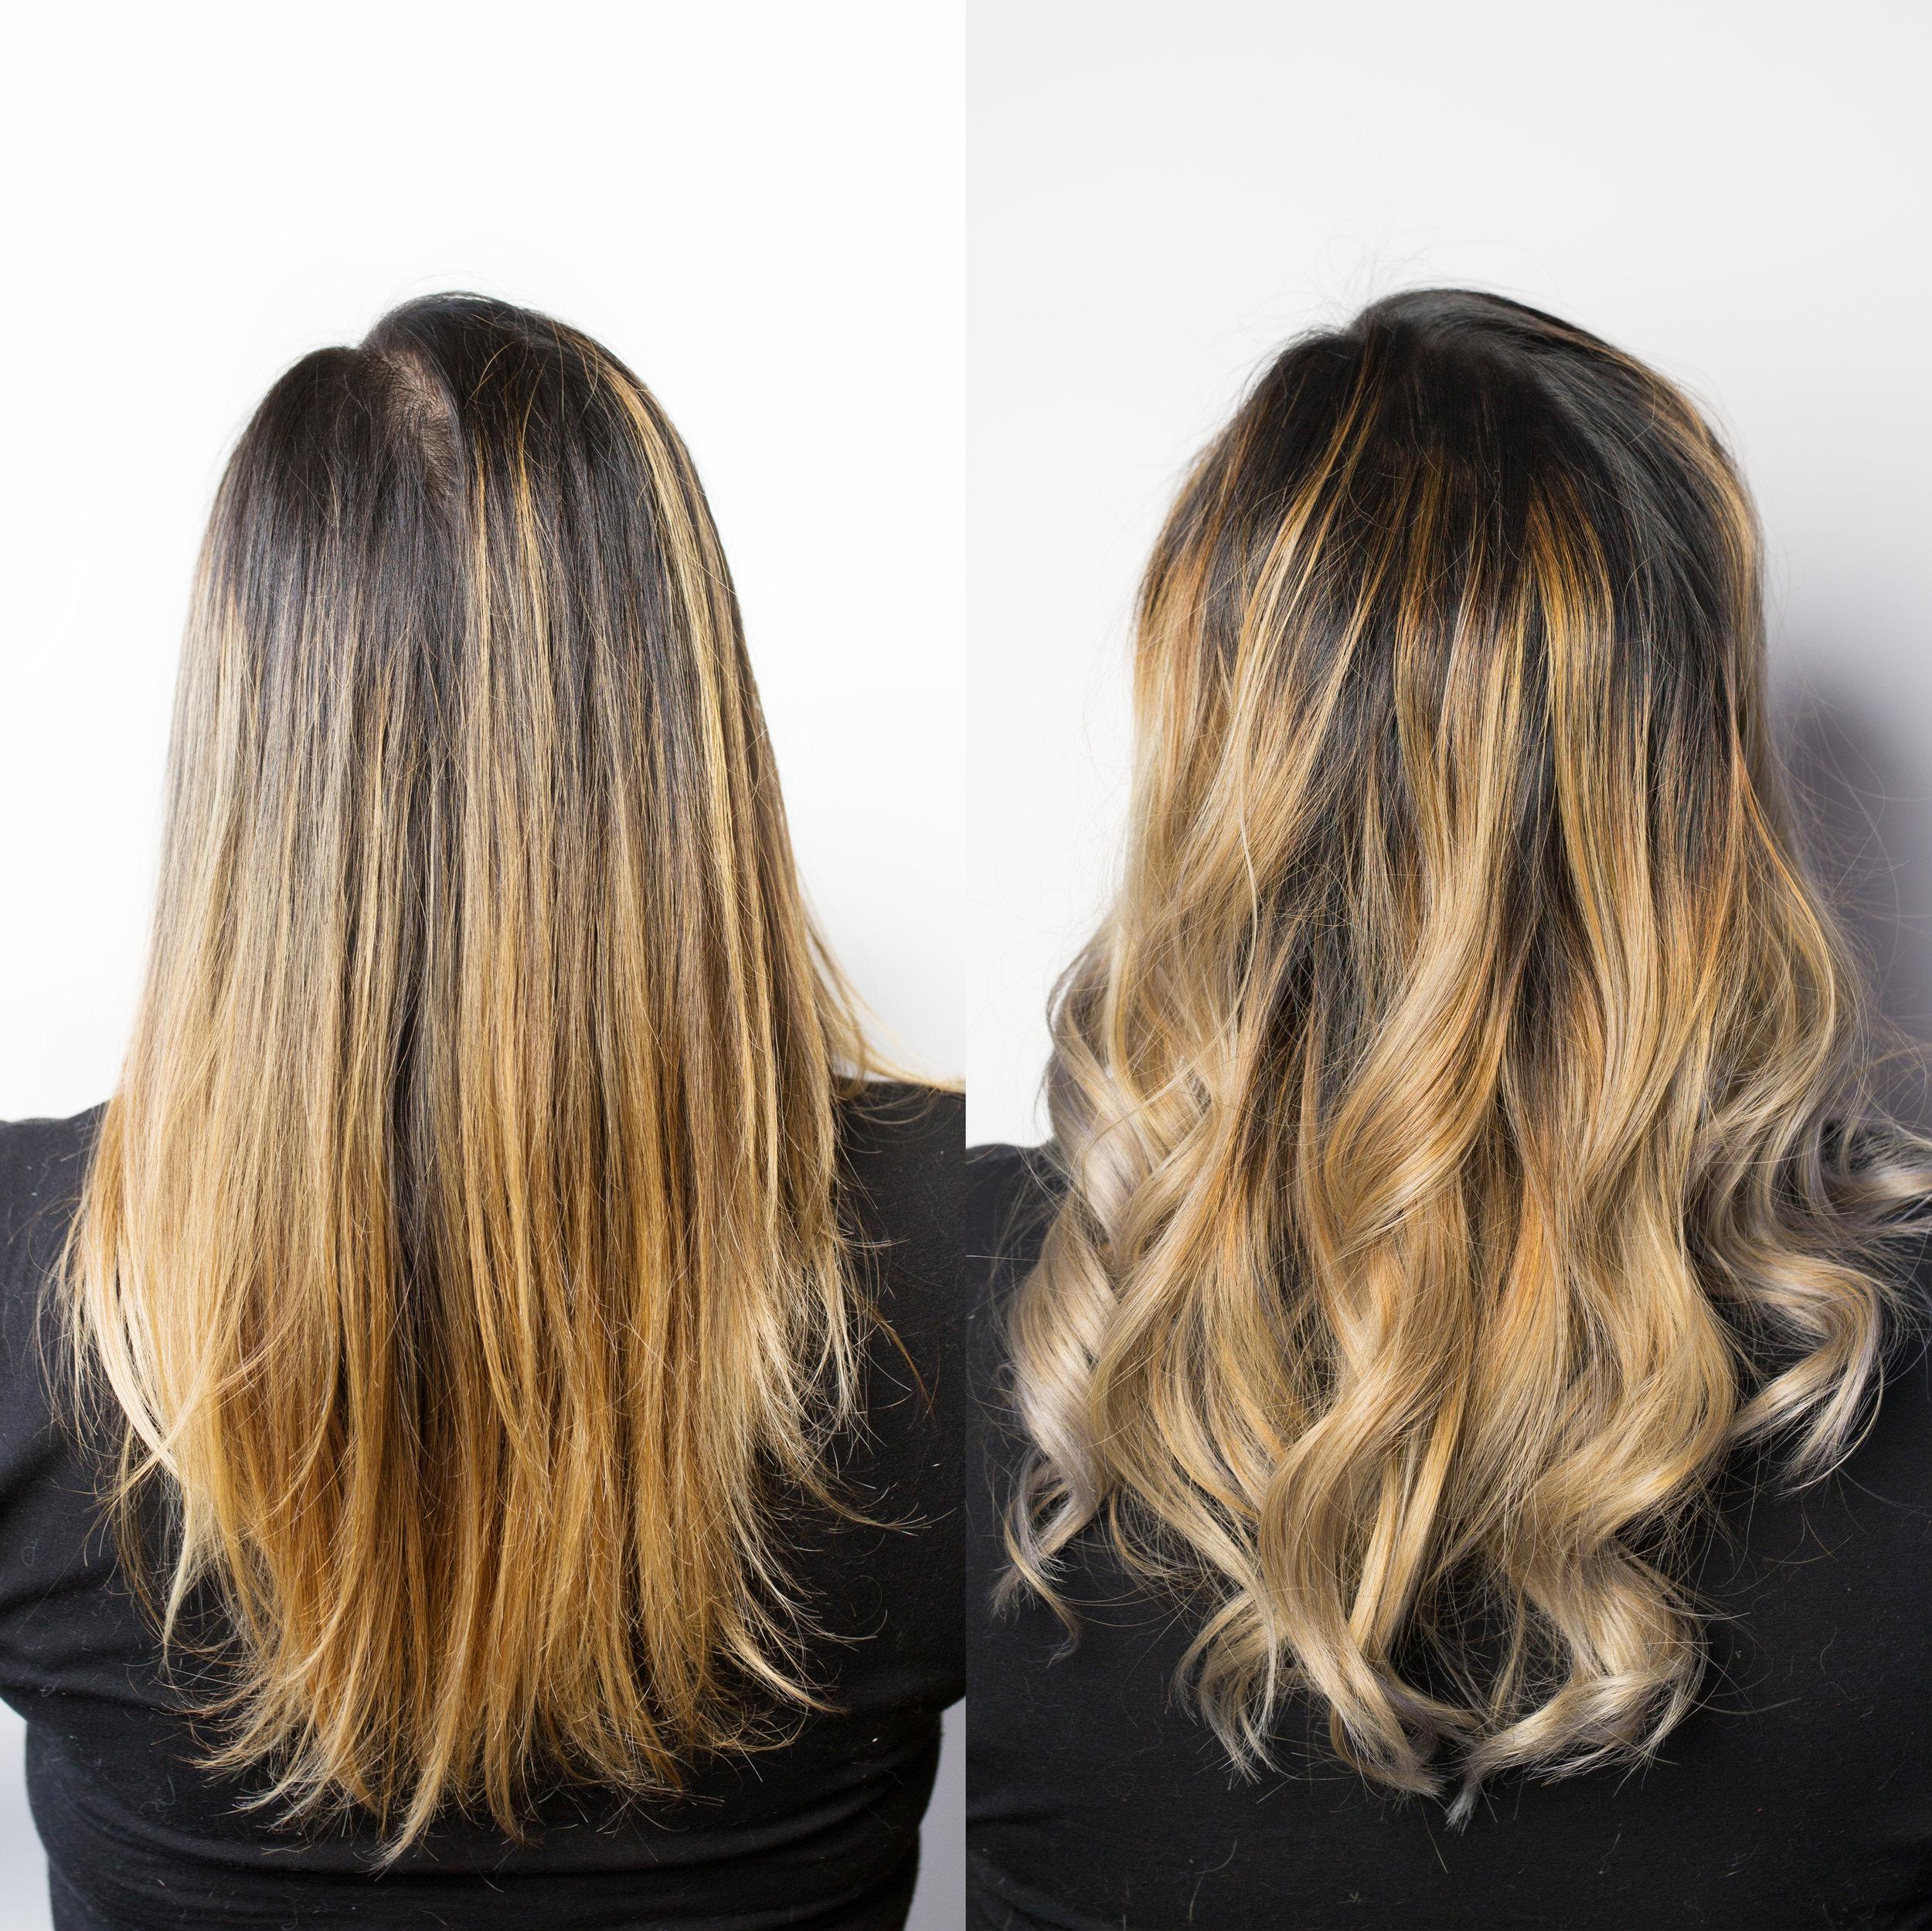 Hair Cut, Color and Style by Tasha